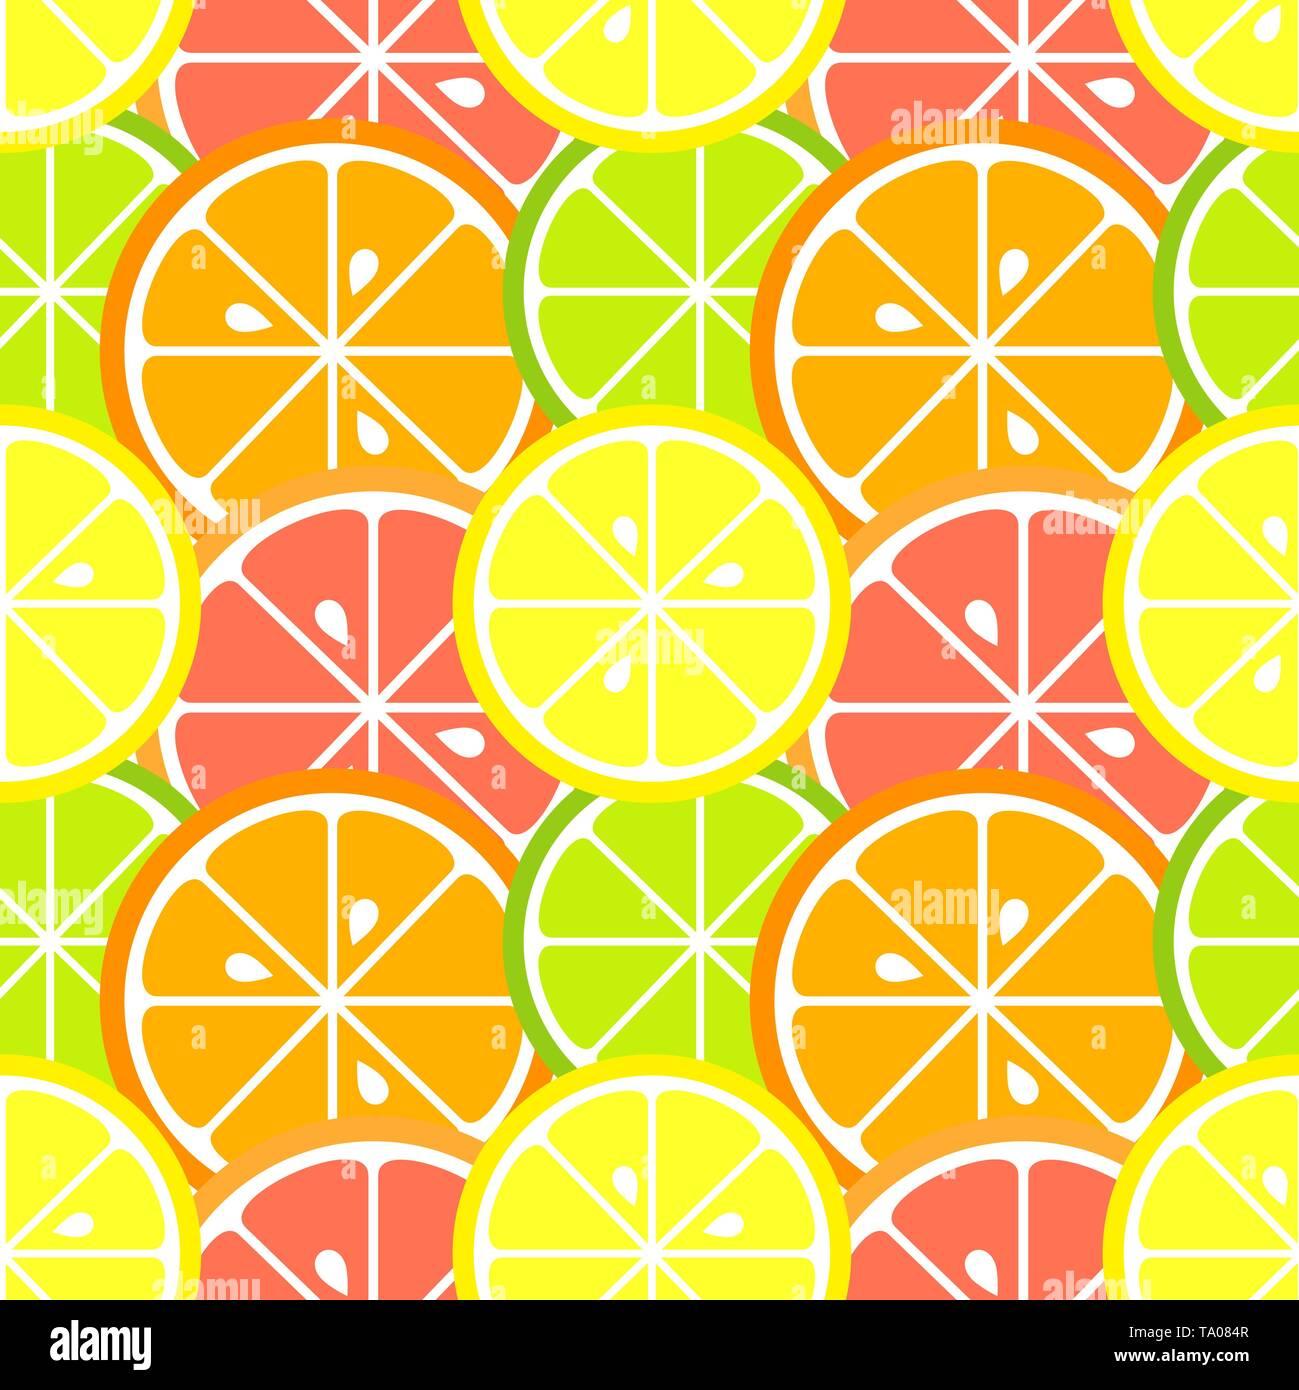 Citrus fruit slices seamless pattern. Vector illustration - Stock Image